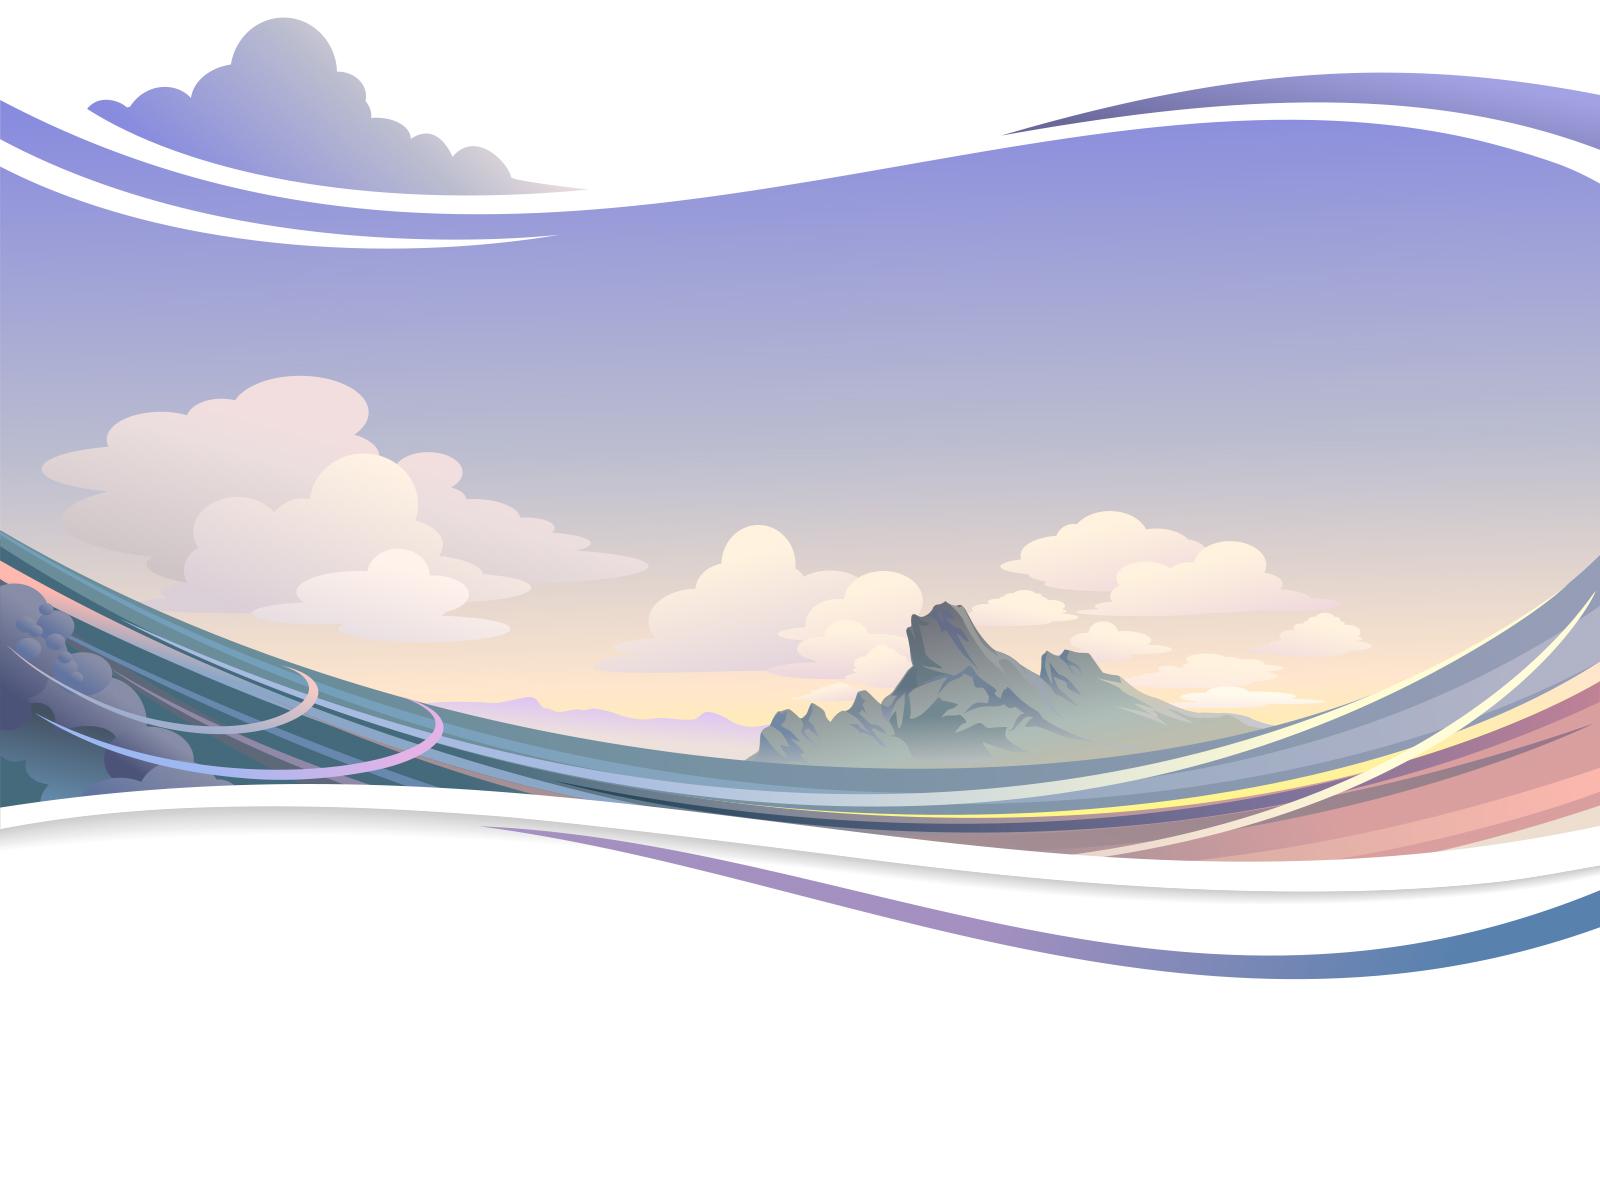 Wavy Sky Landscape Backgrounds Blue Design Nature Navy White